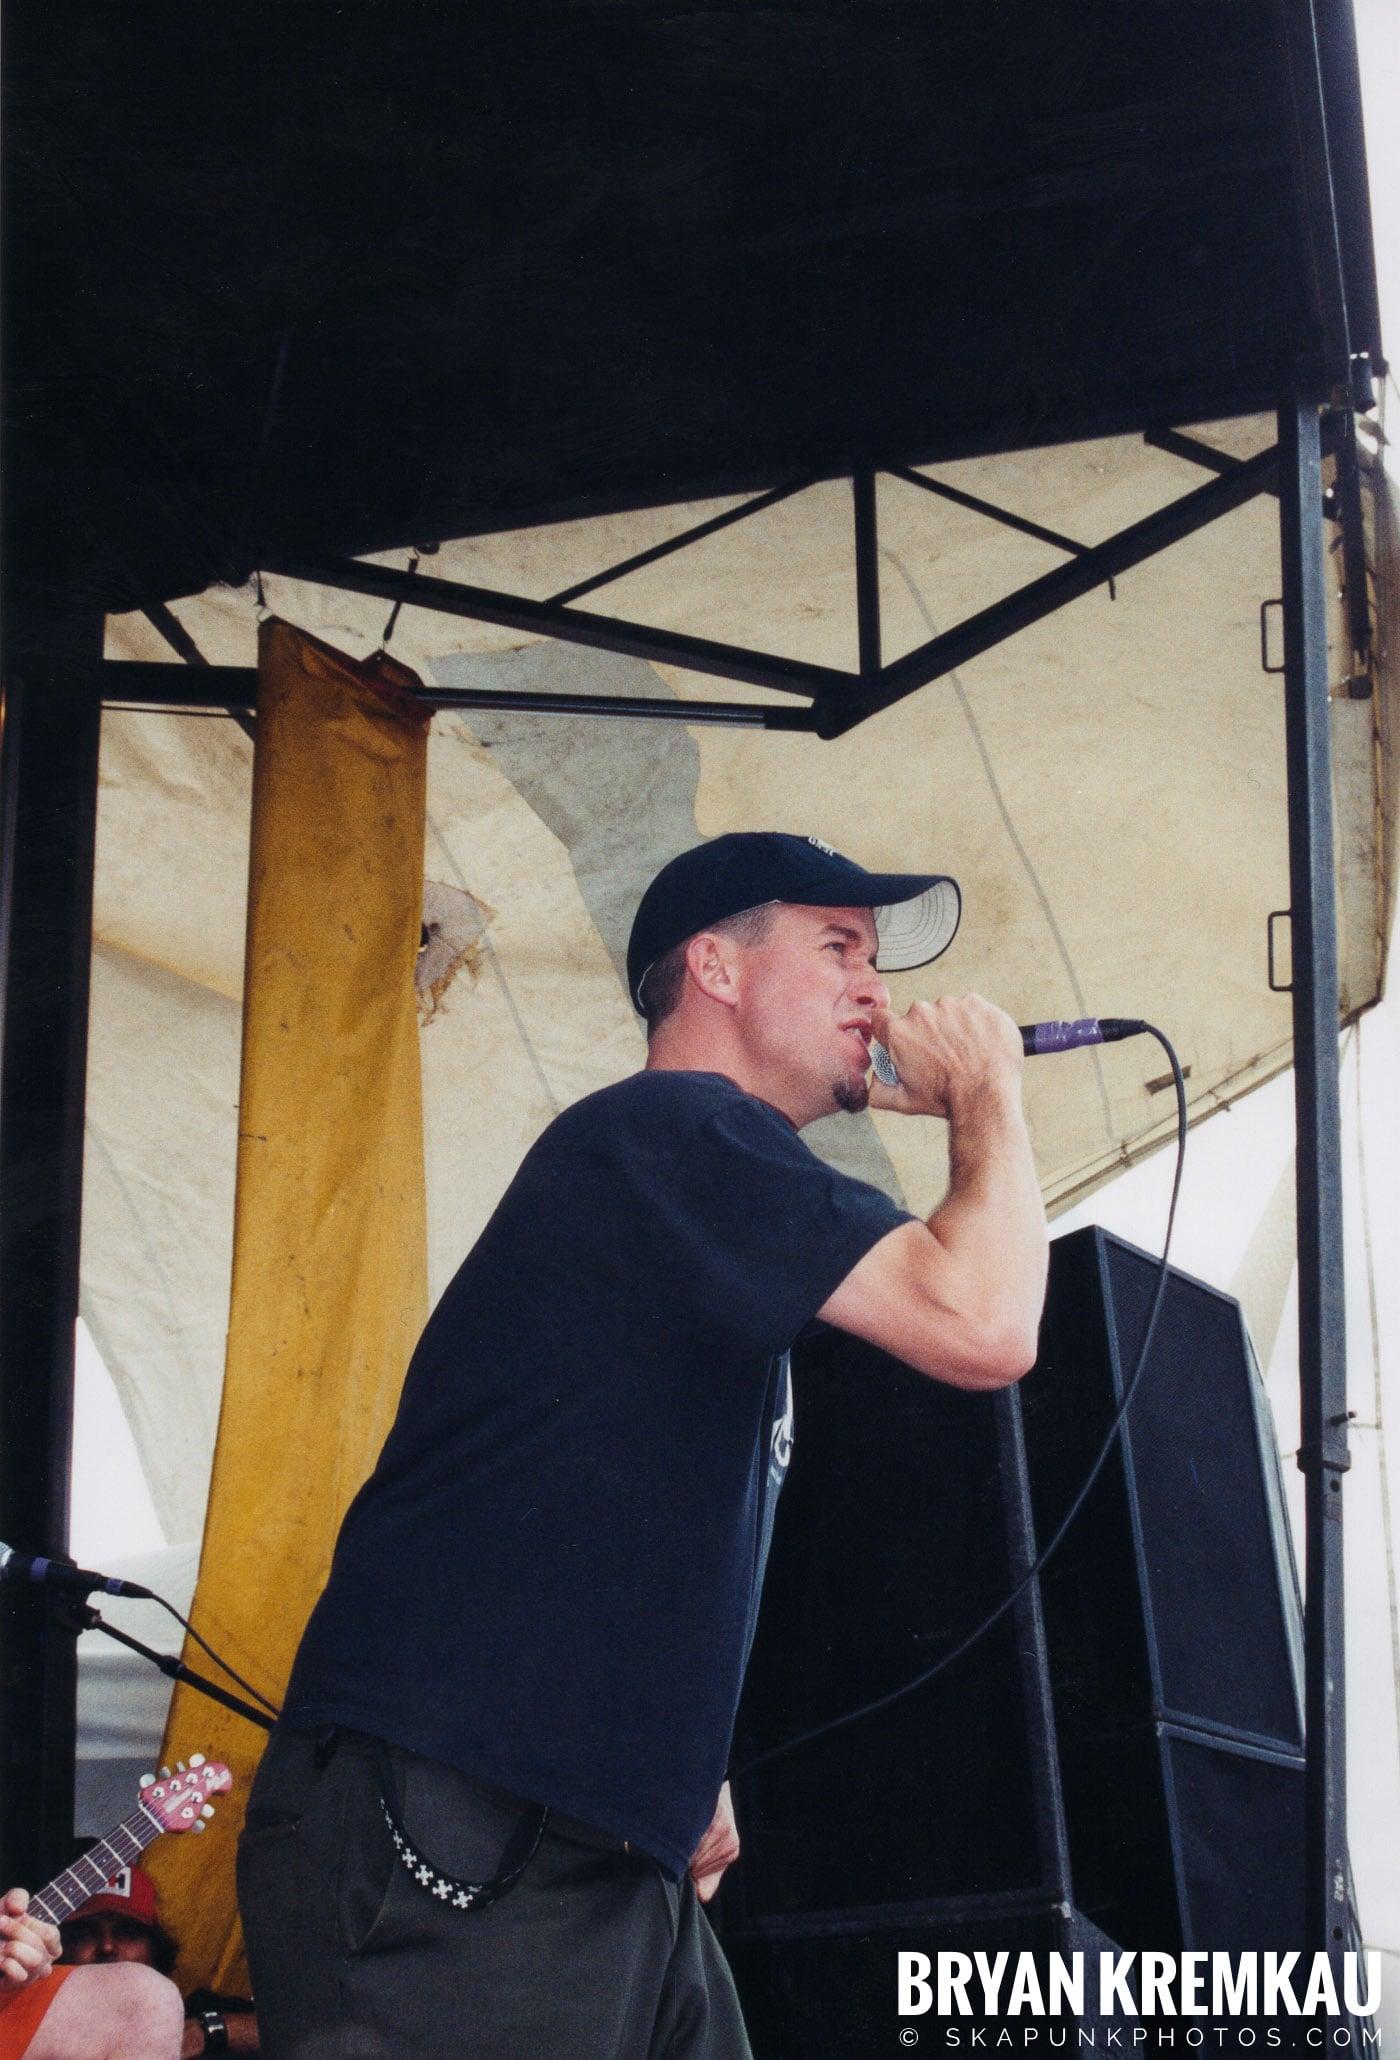 The Vandals @ Vans Warped Tour, Randall's Island, NYC - 8.7.04 (1)